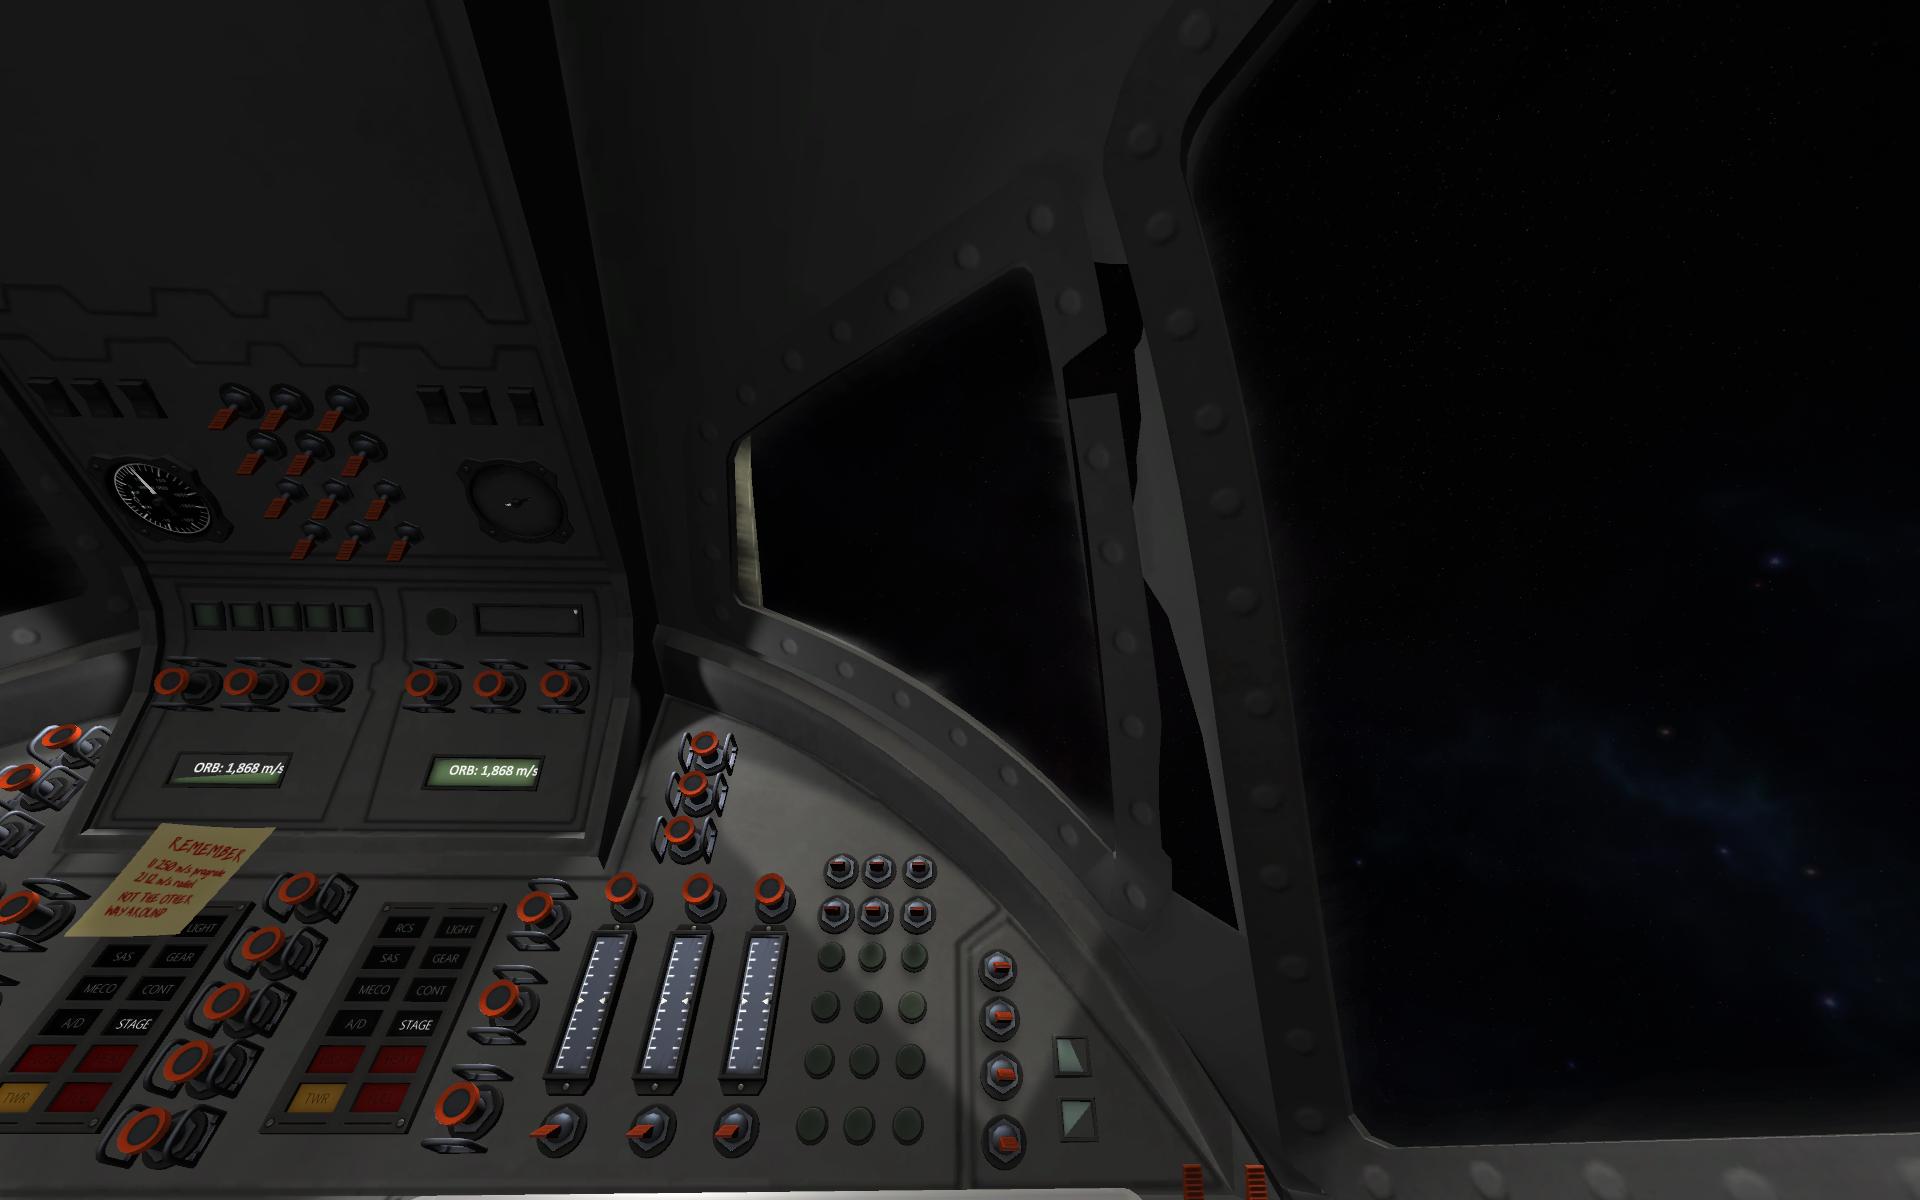 screenshot153.png